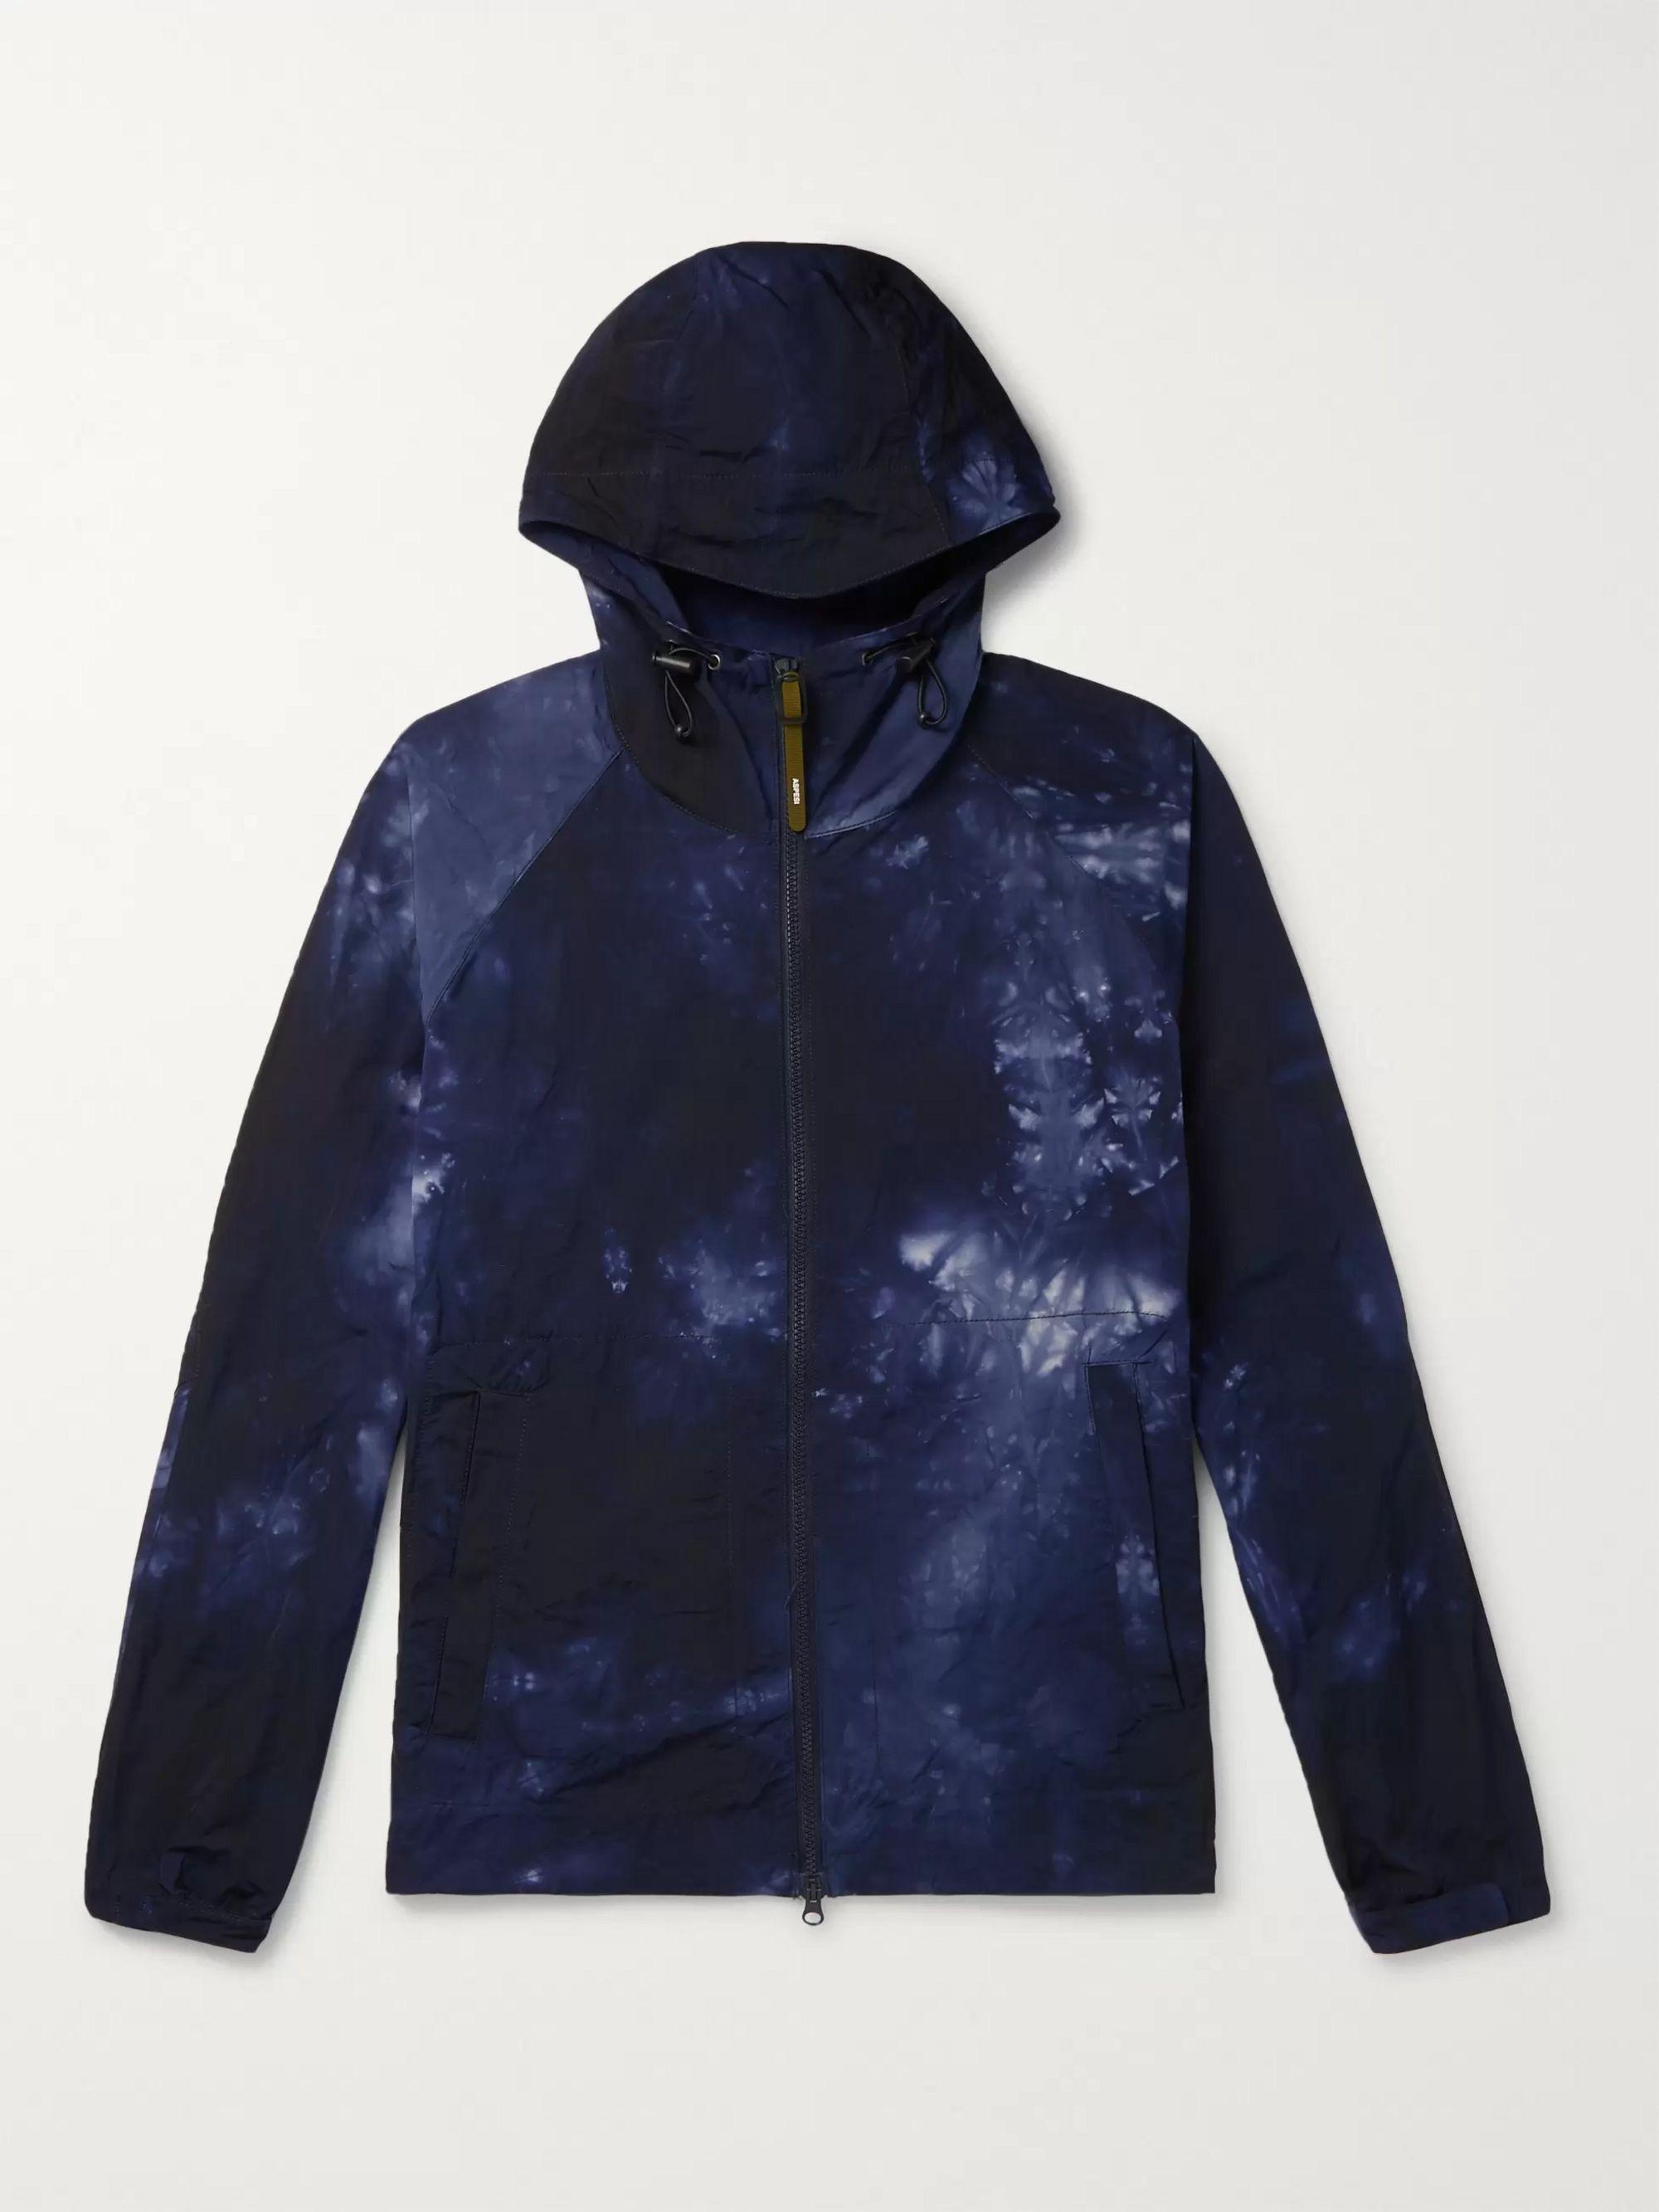 Blue Tie-Dyed Hooded Shell Jacket | Aspesi | MR PORTER